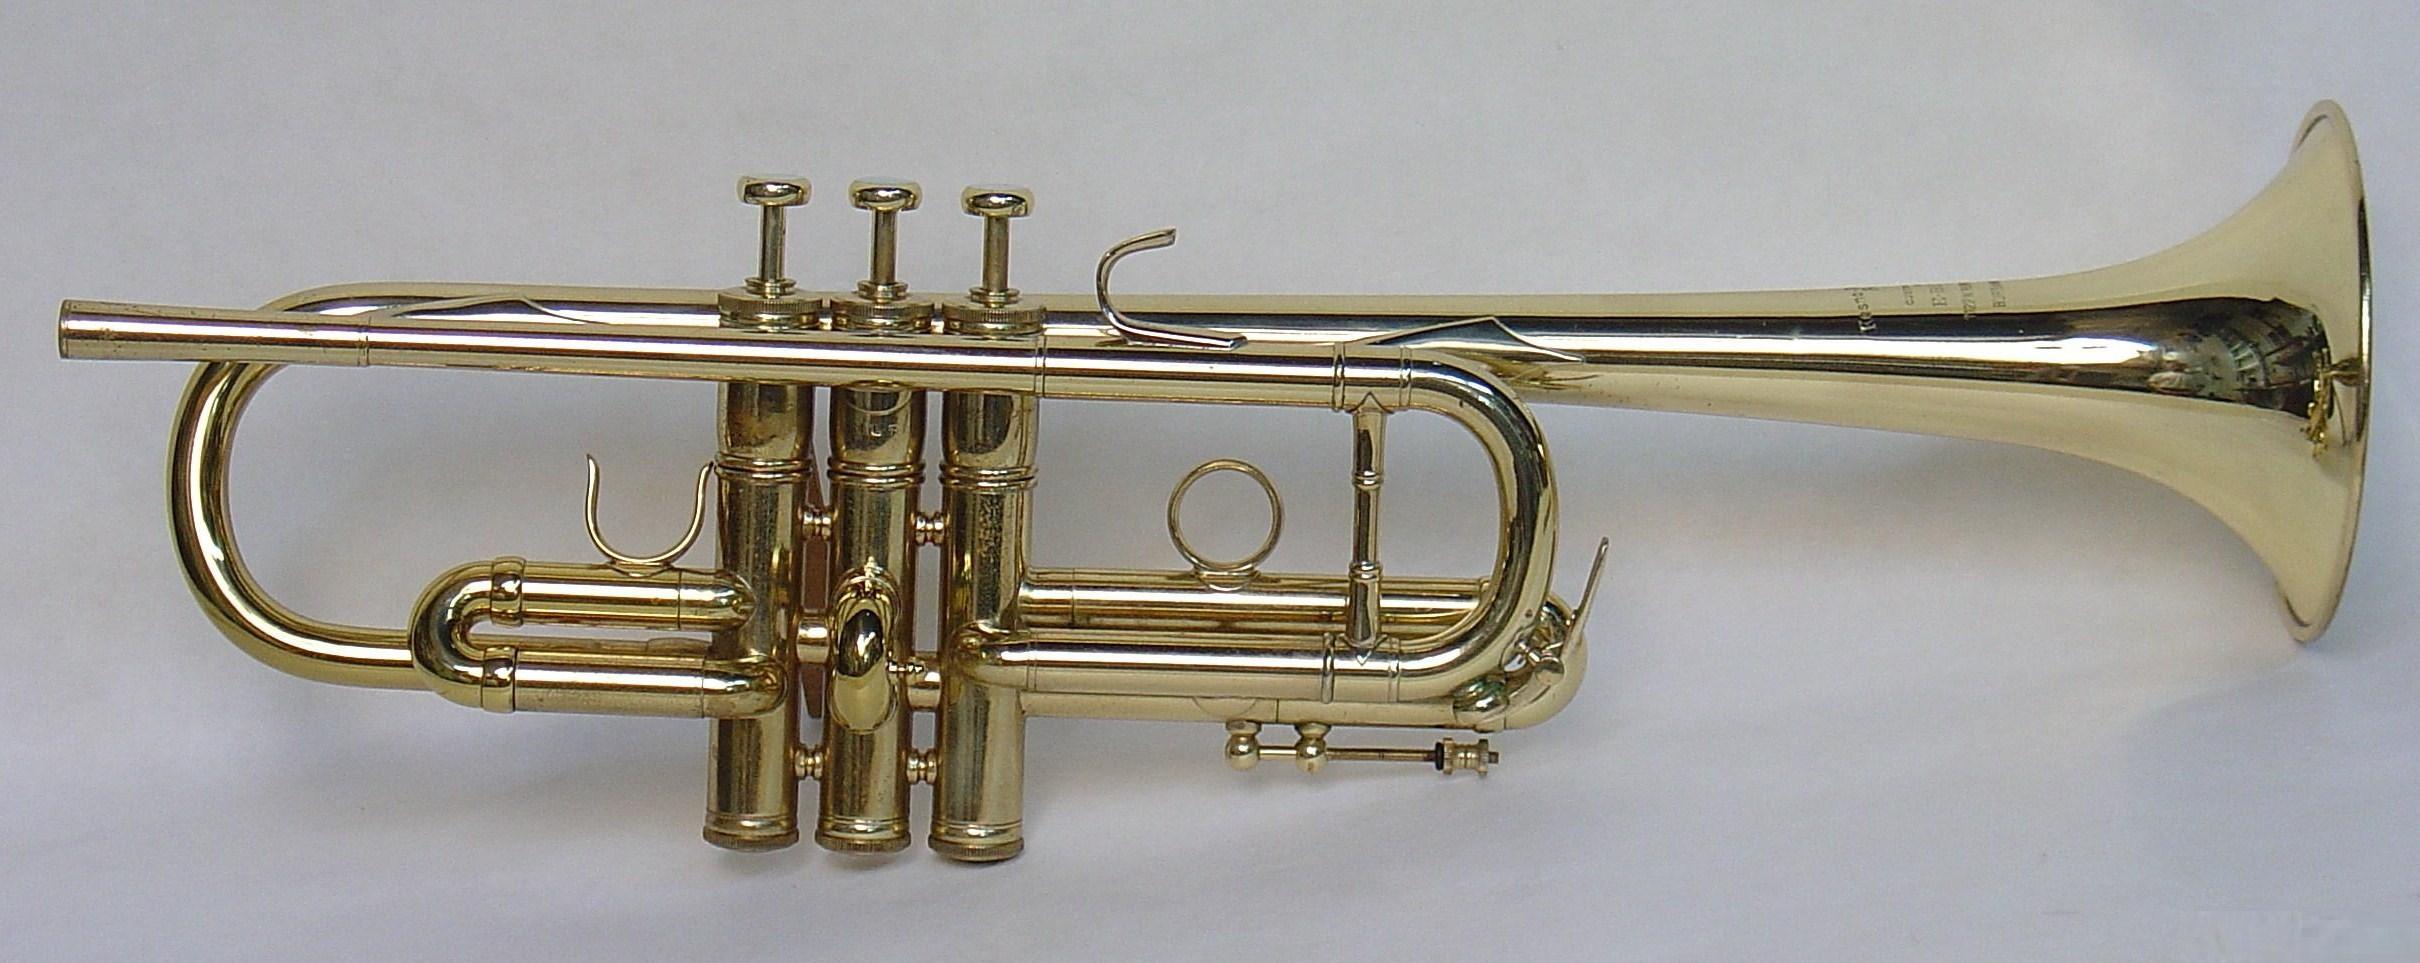 Bob DiVall's Benge C Trumpet